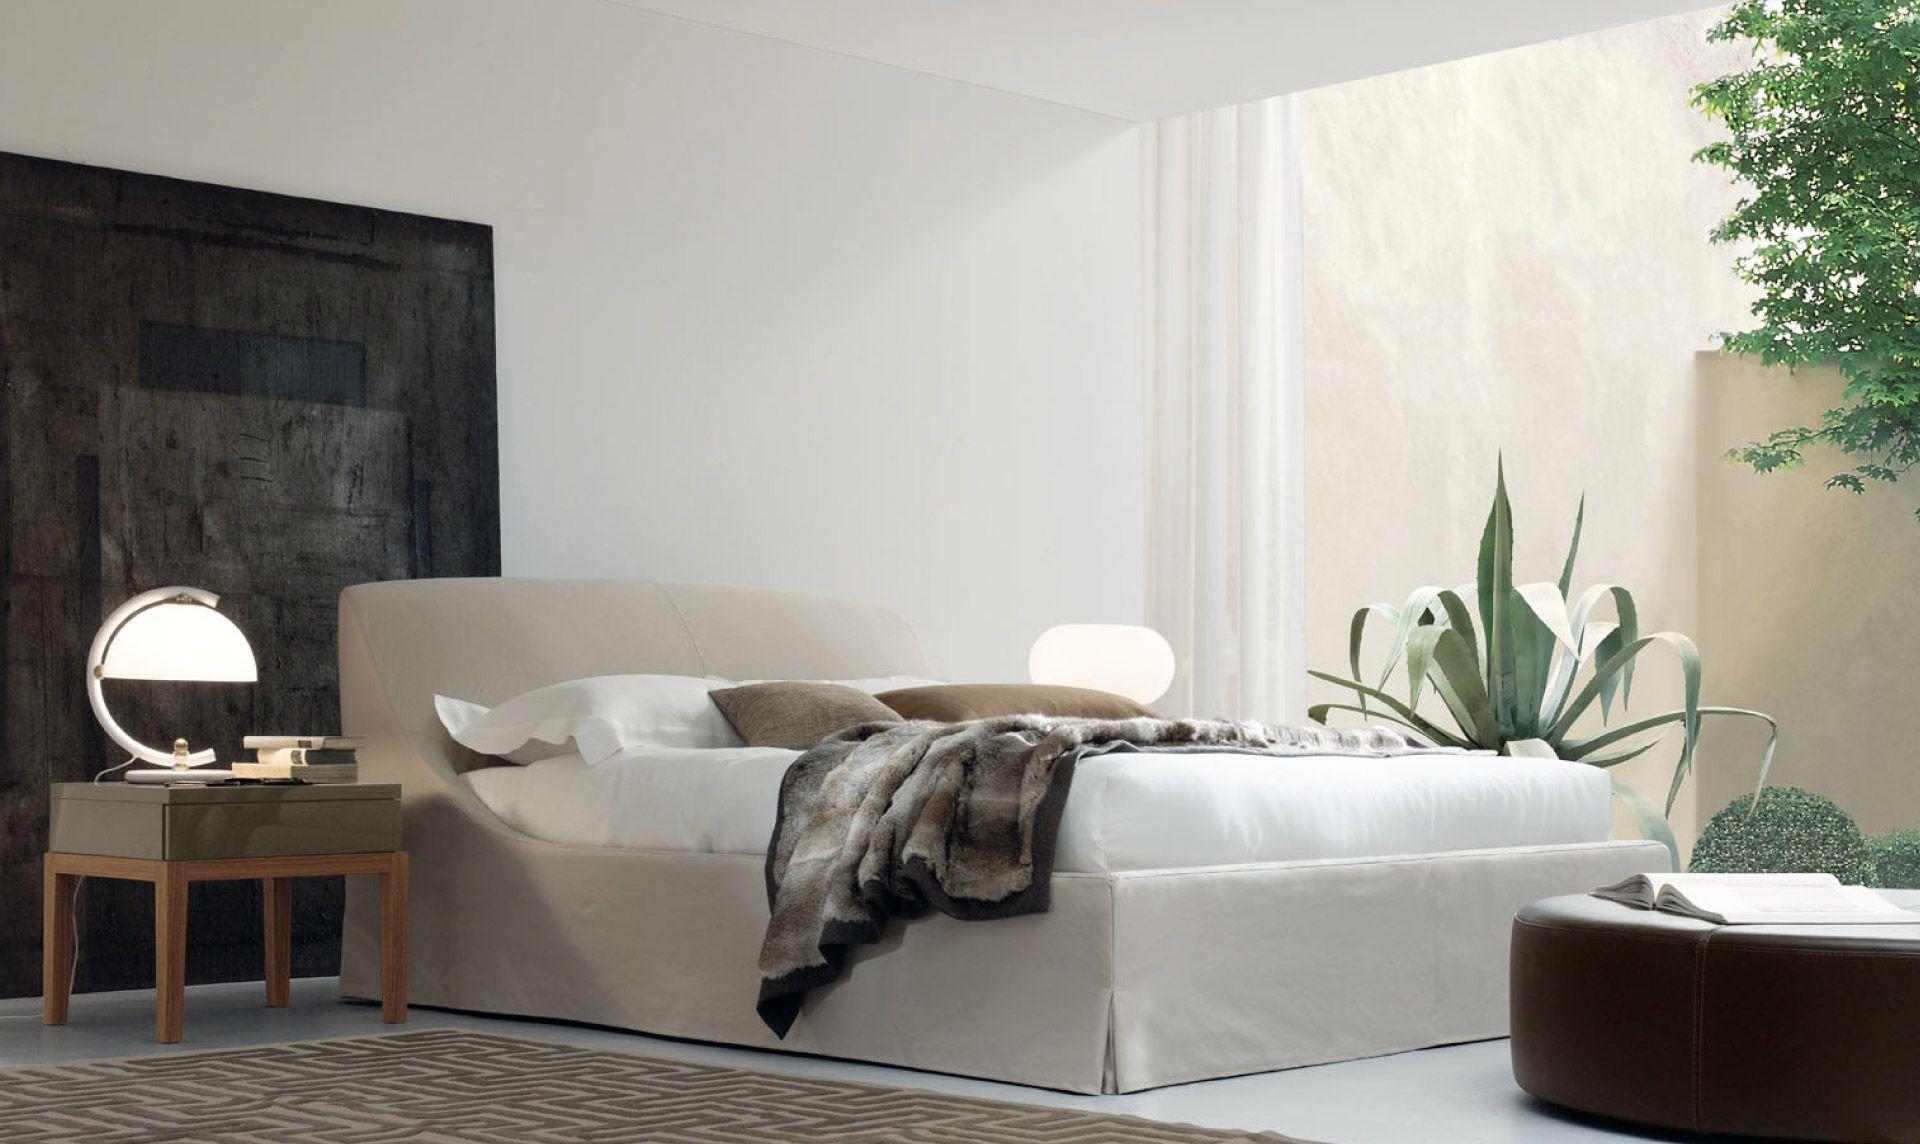 Jesse Mobili ~ Jesse mobili arredamento design gruppi notte de ville